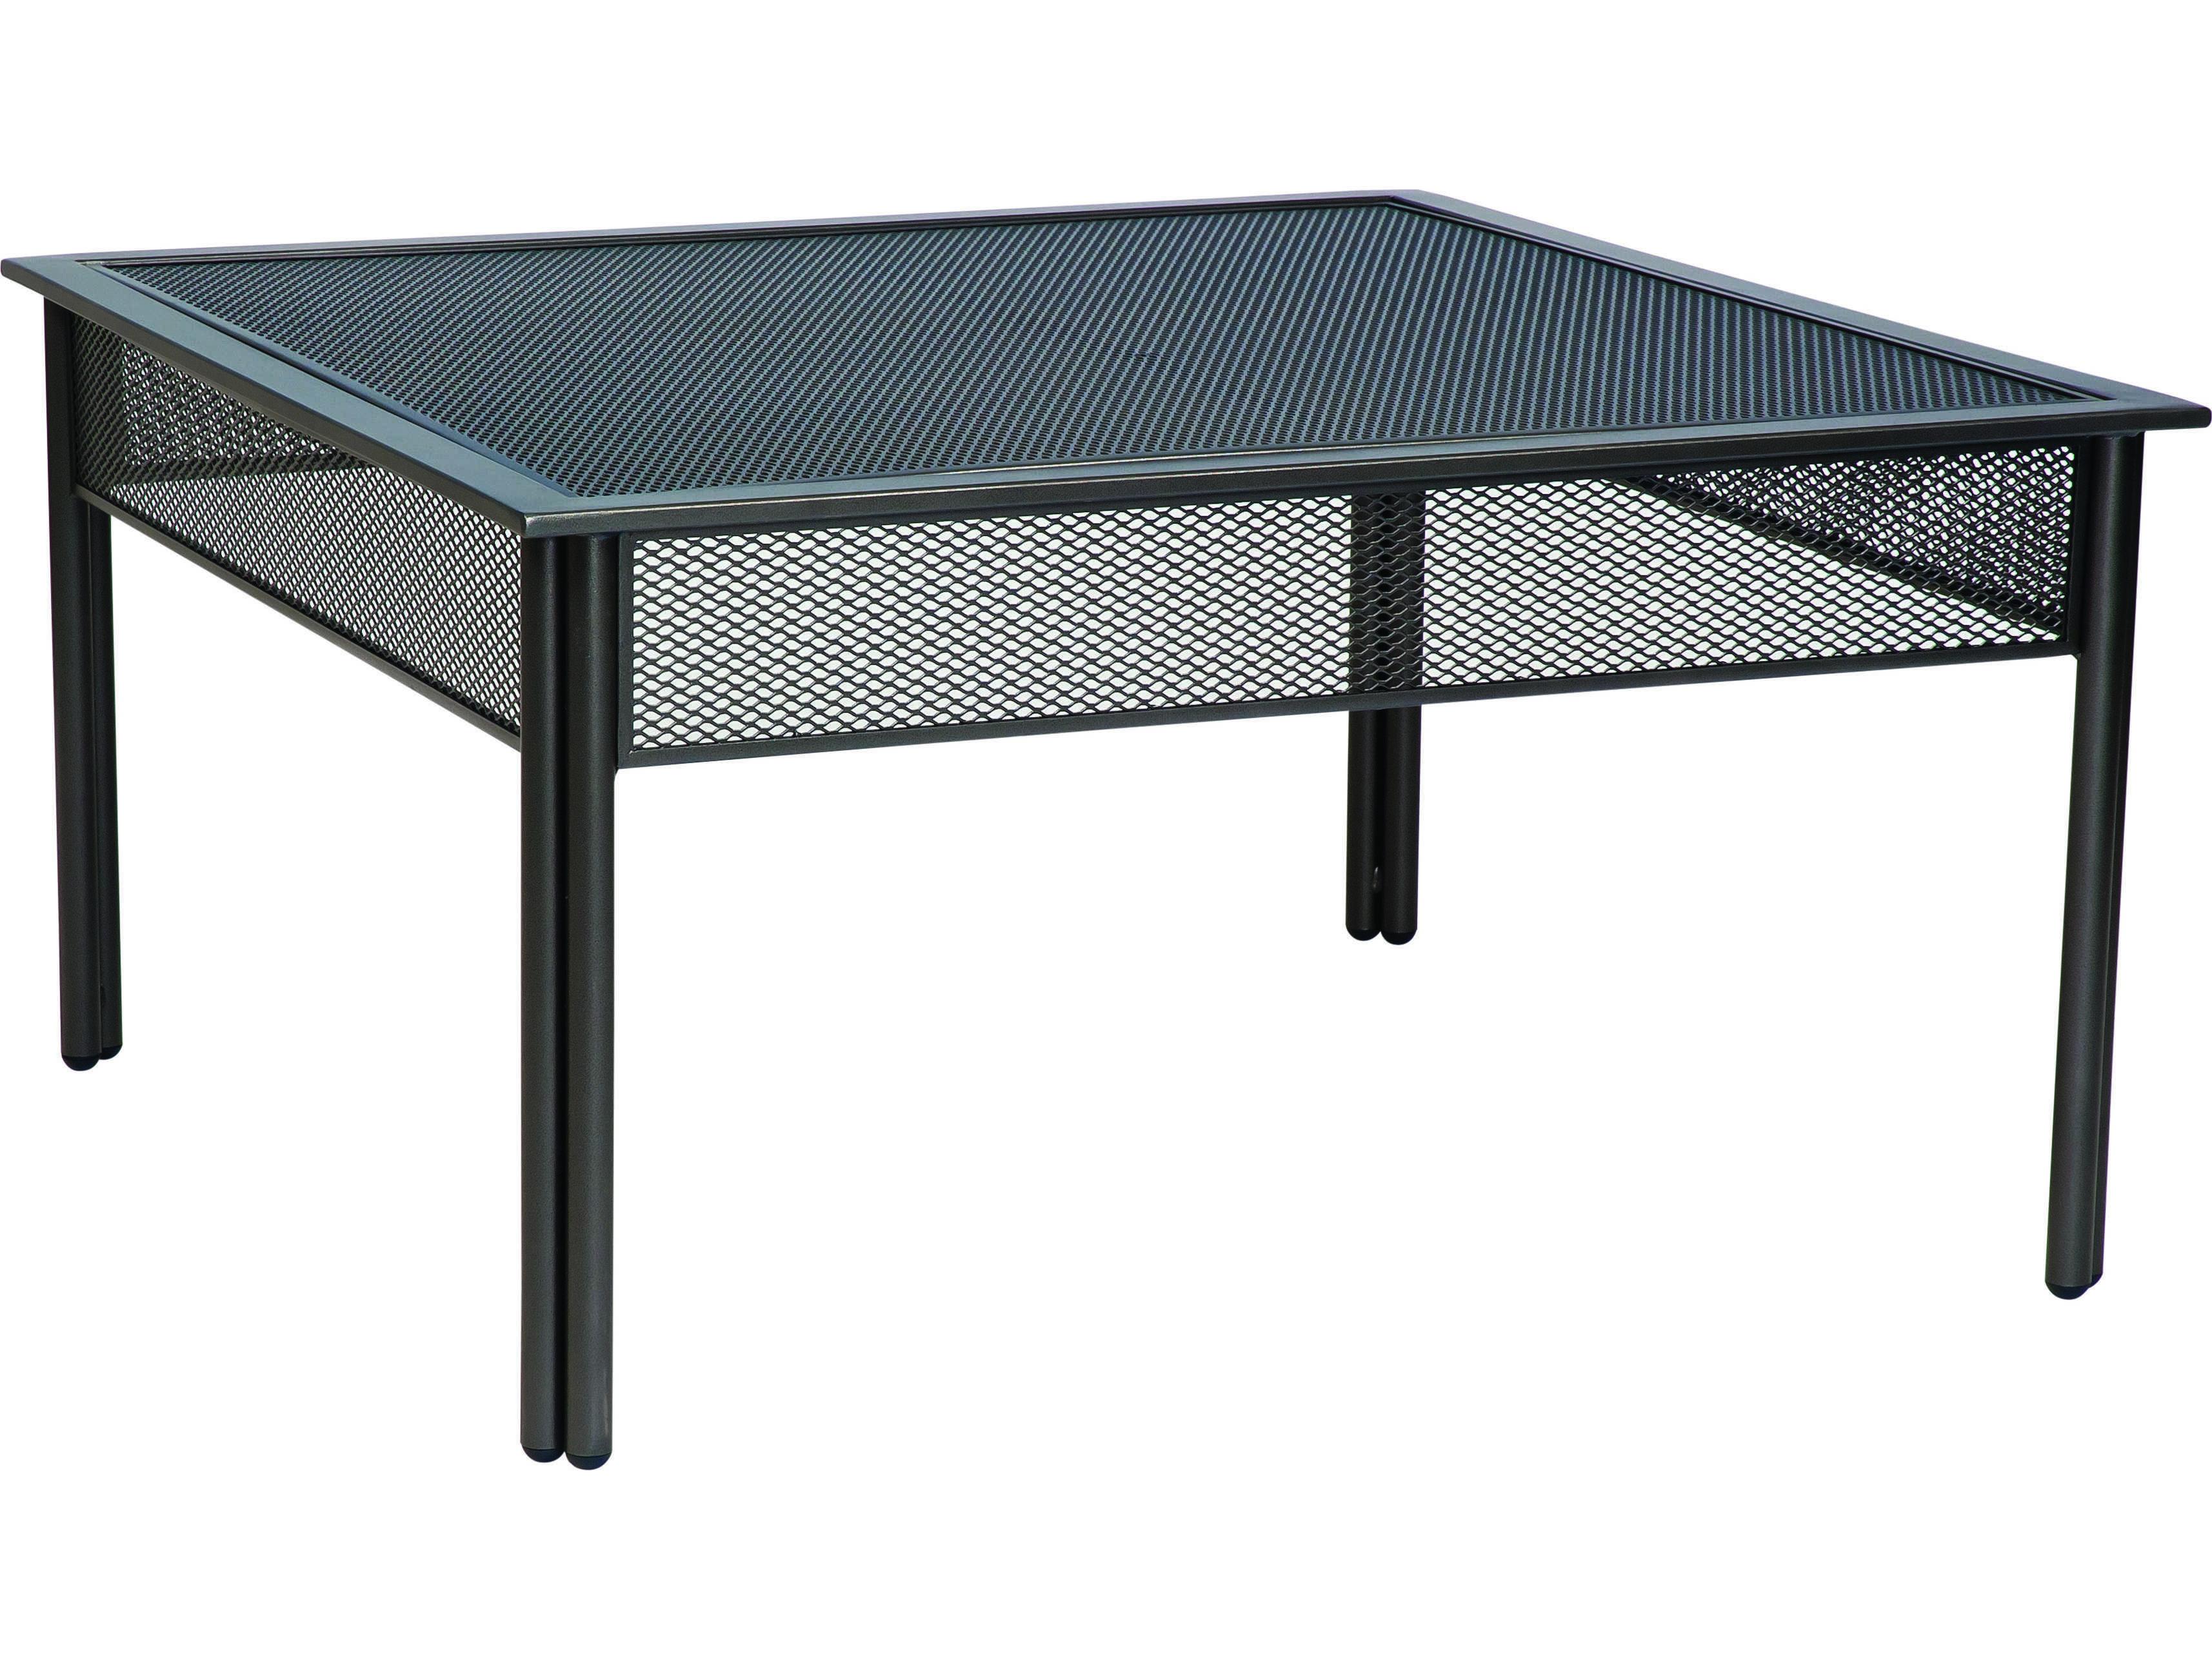 Woodard Jax Wrought Iron 38 3 Square Micro Mesh Coffee Table 2j0053mm